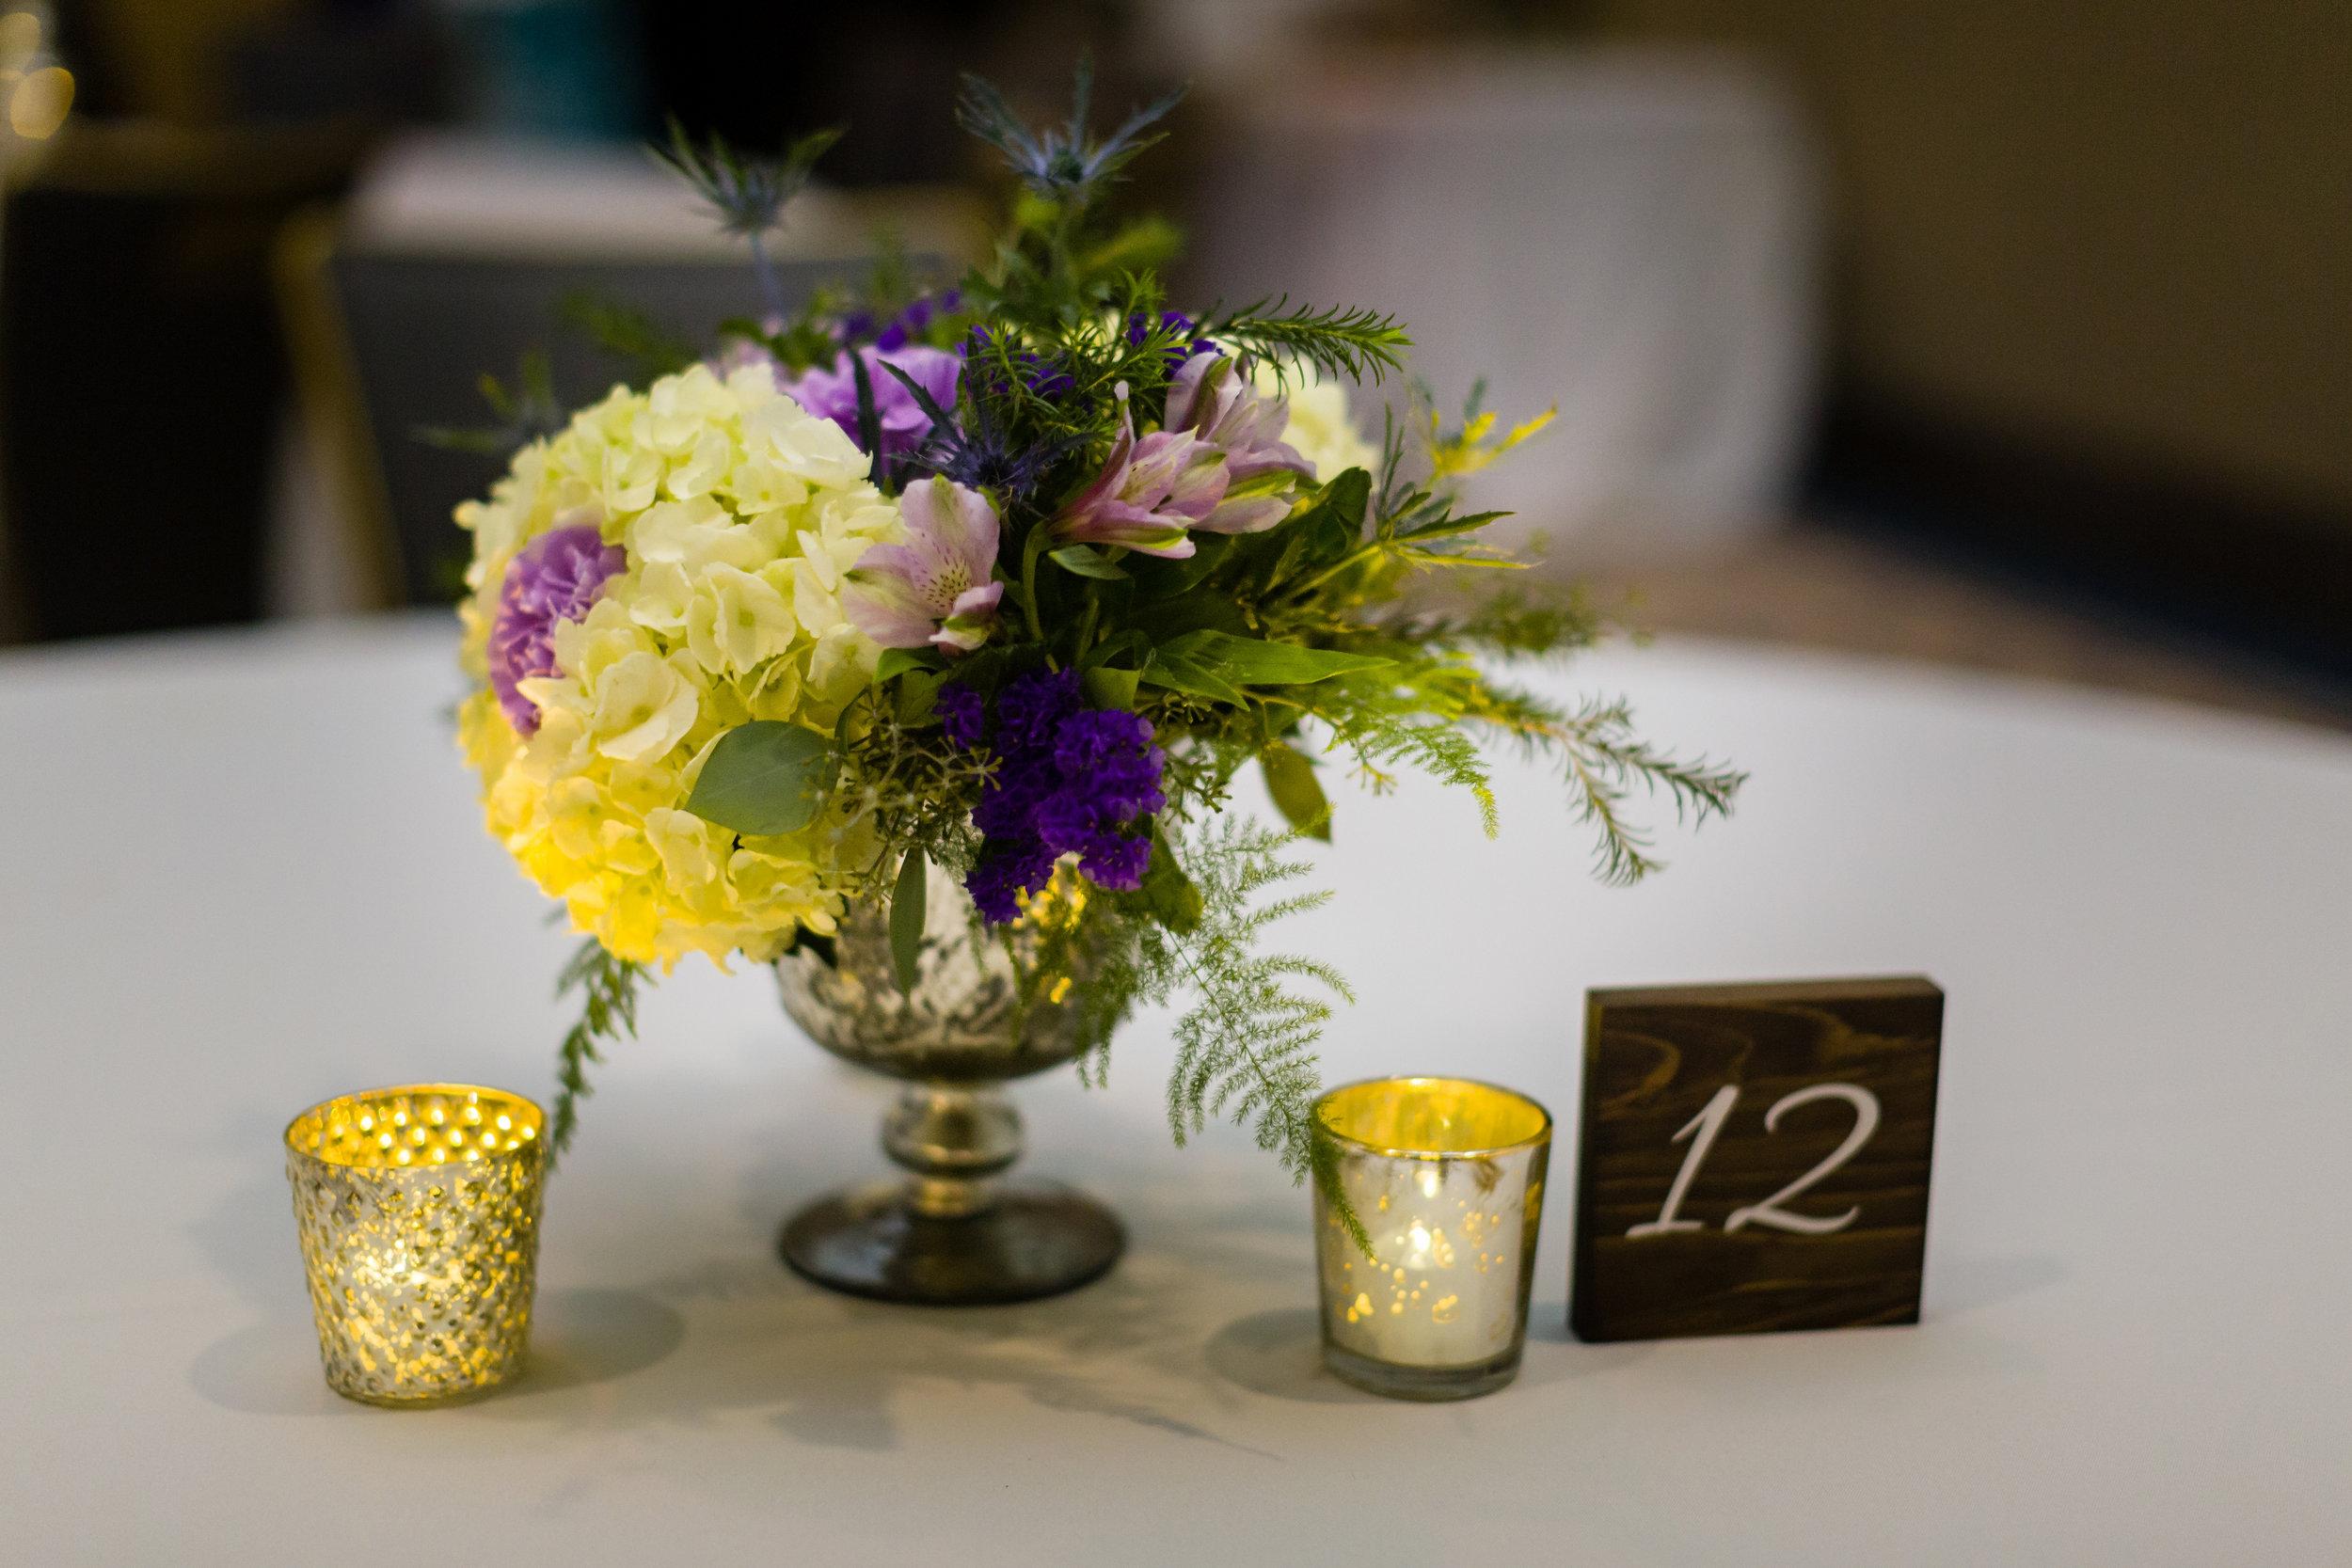 Simple Wedding Centerpieces - Pittsburgh Wedding Venue - Duquesne University Wedding